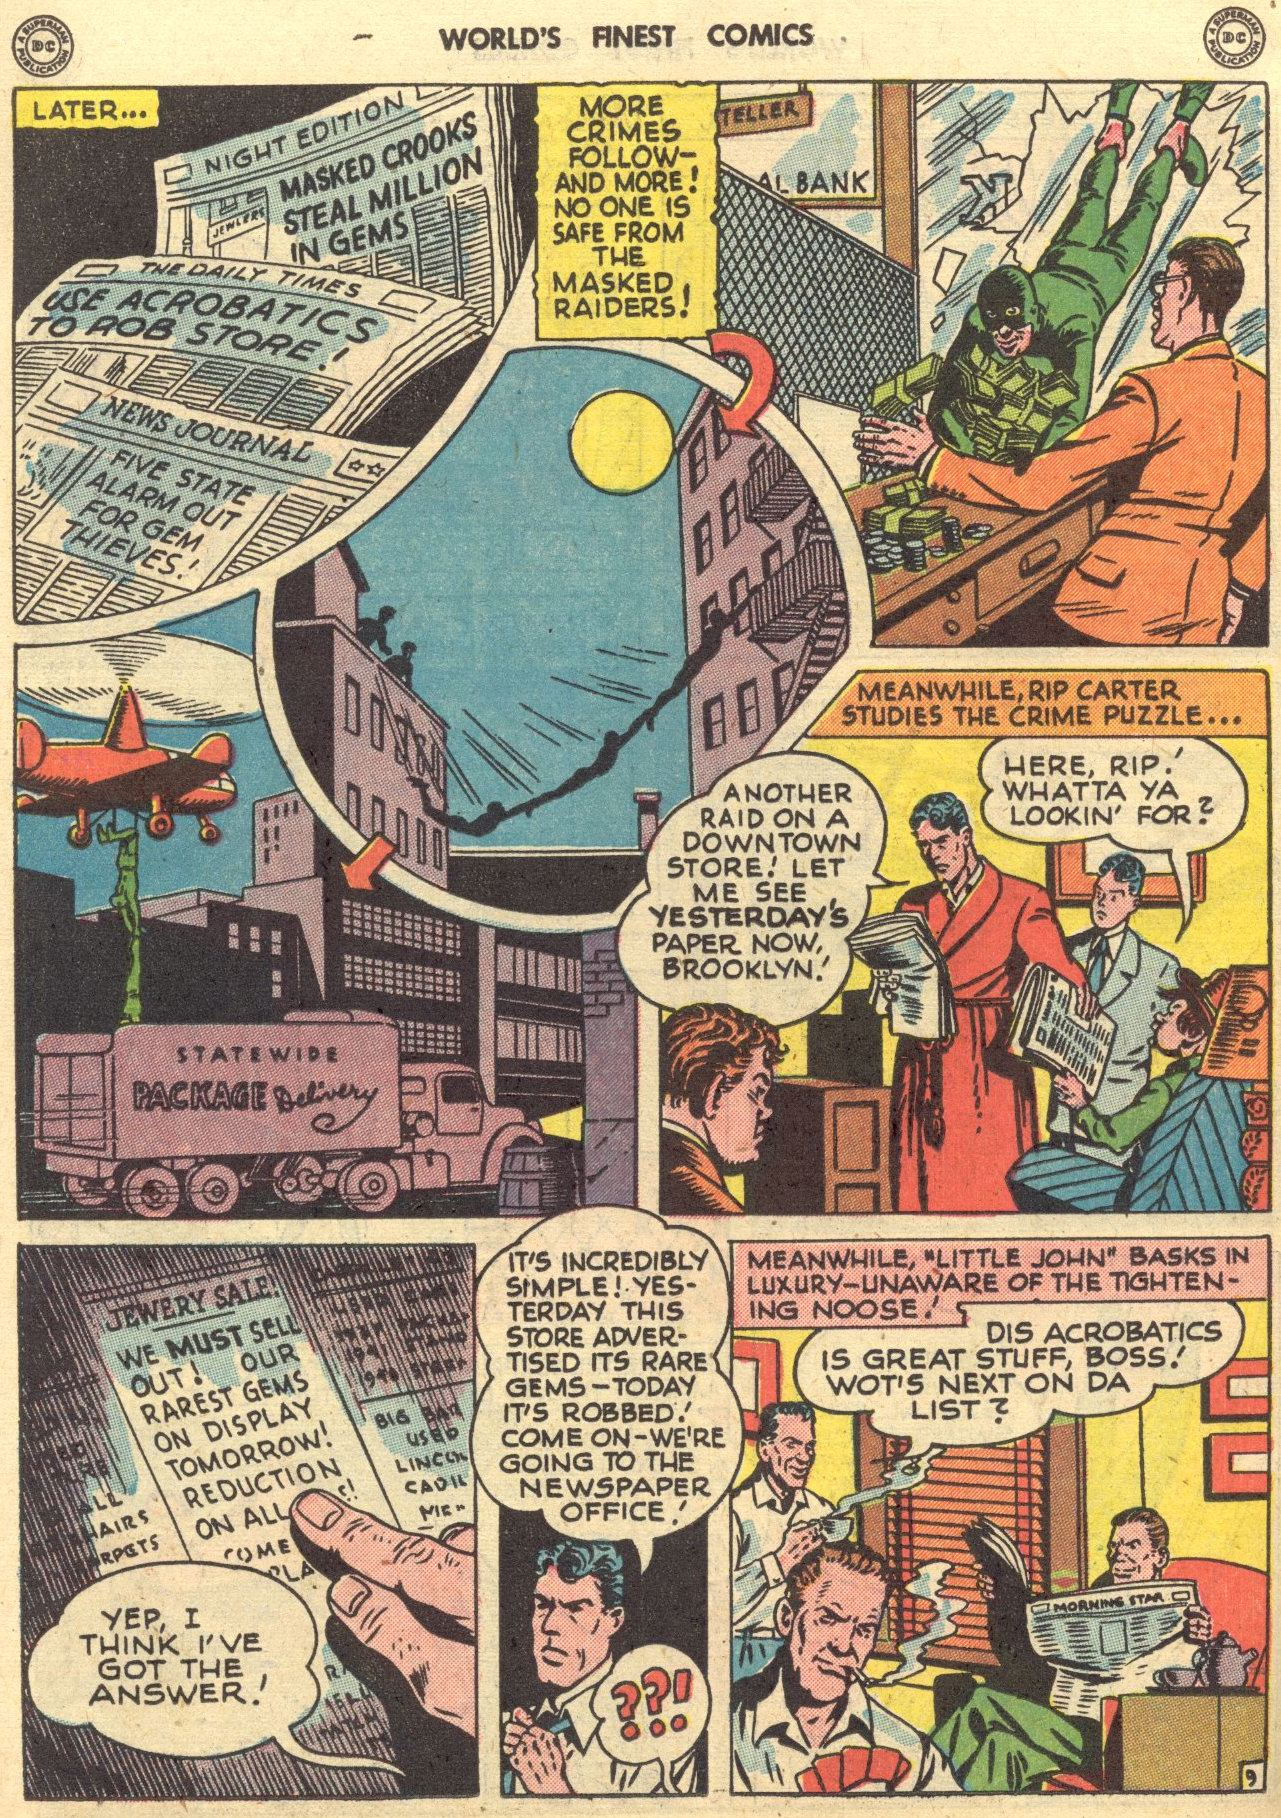 Read online World's Finest Comics comic -  Issue #28 - 37